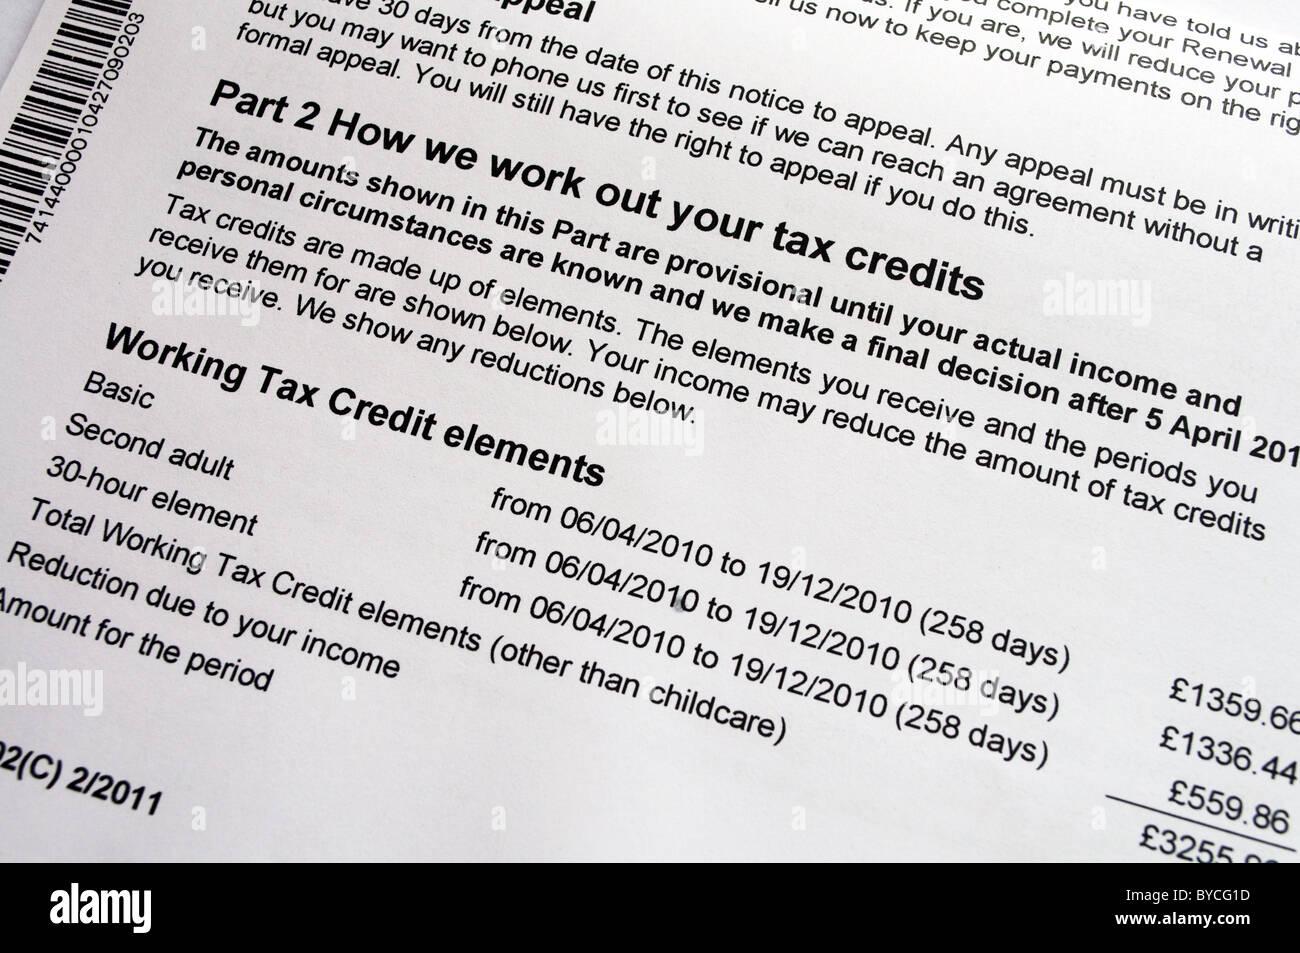 A tax credits award notification form - Stock Image